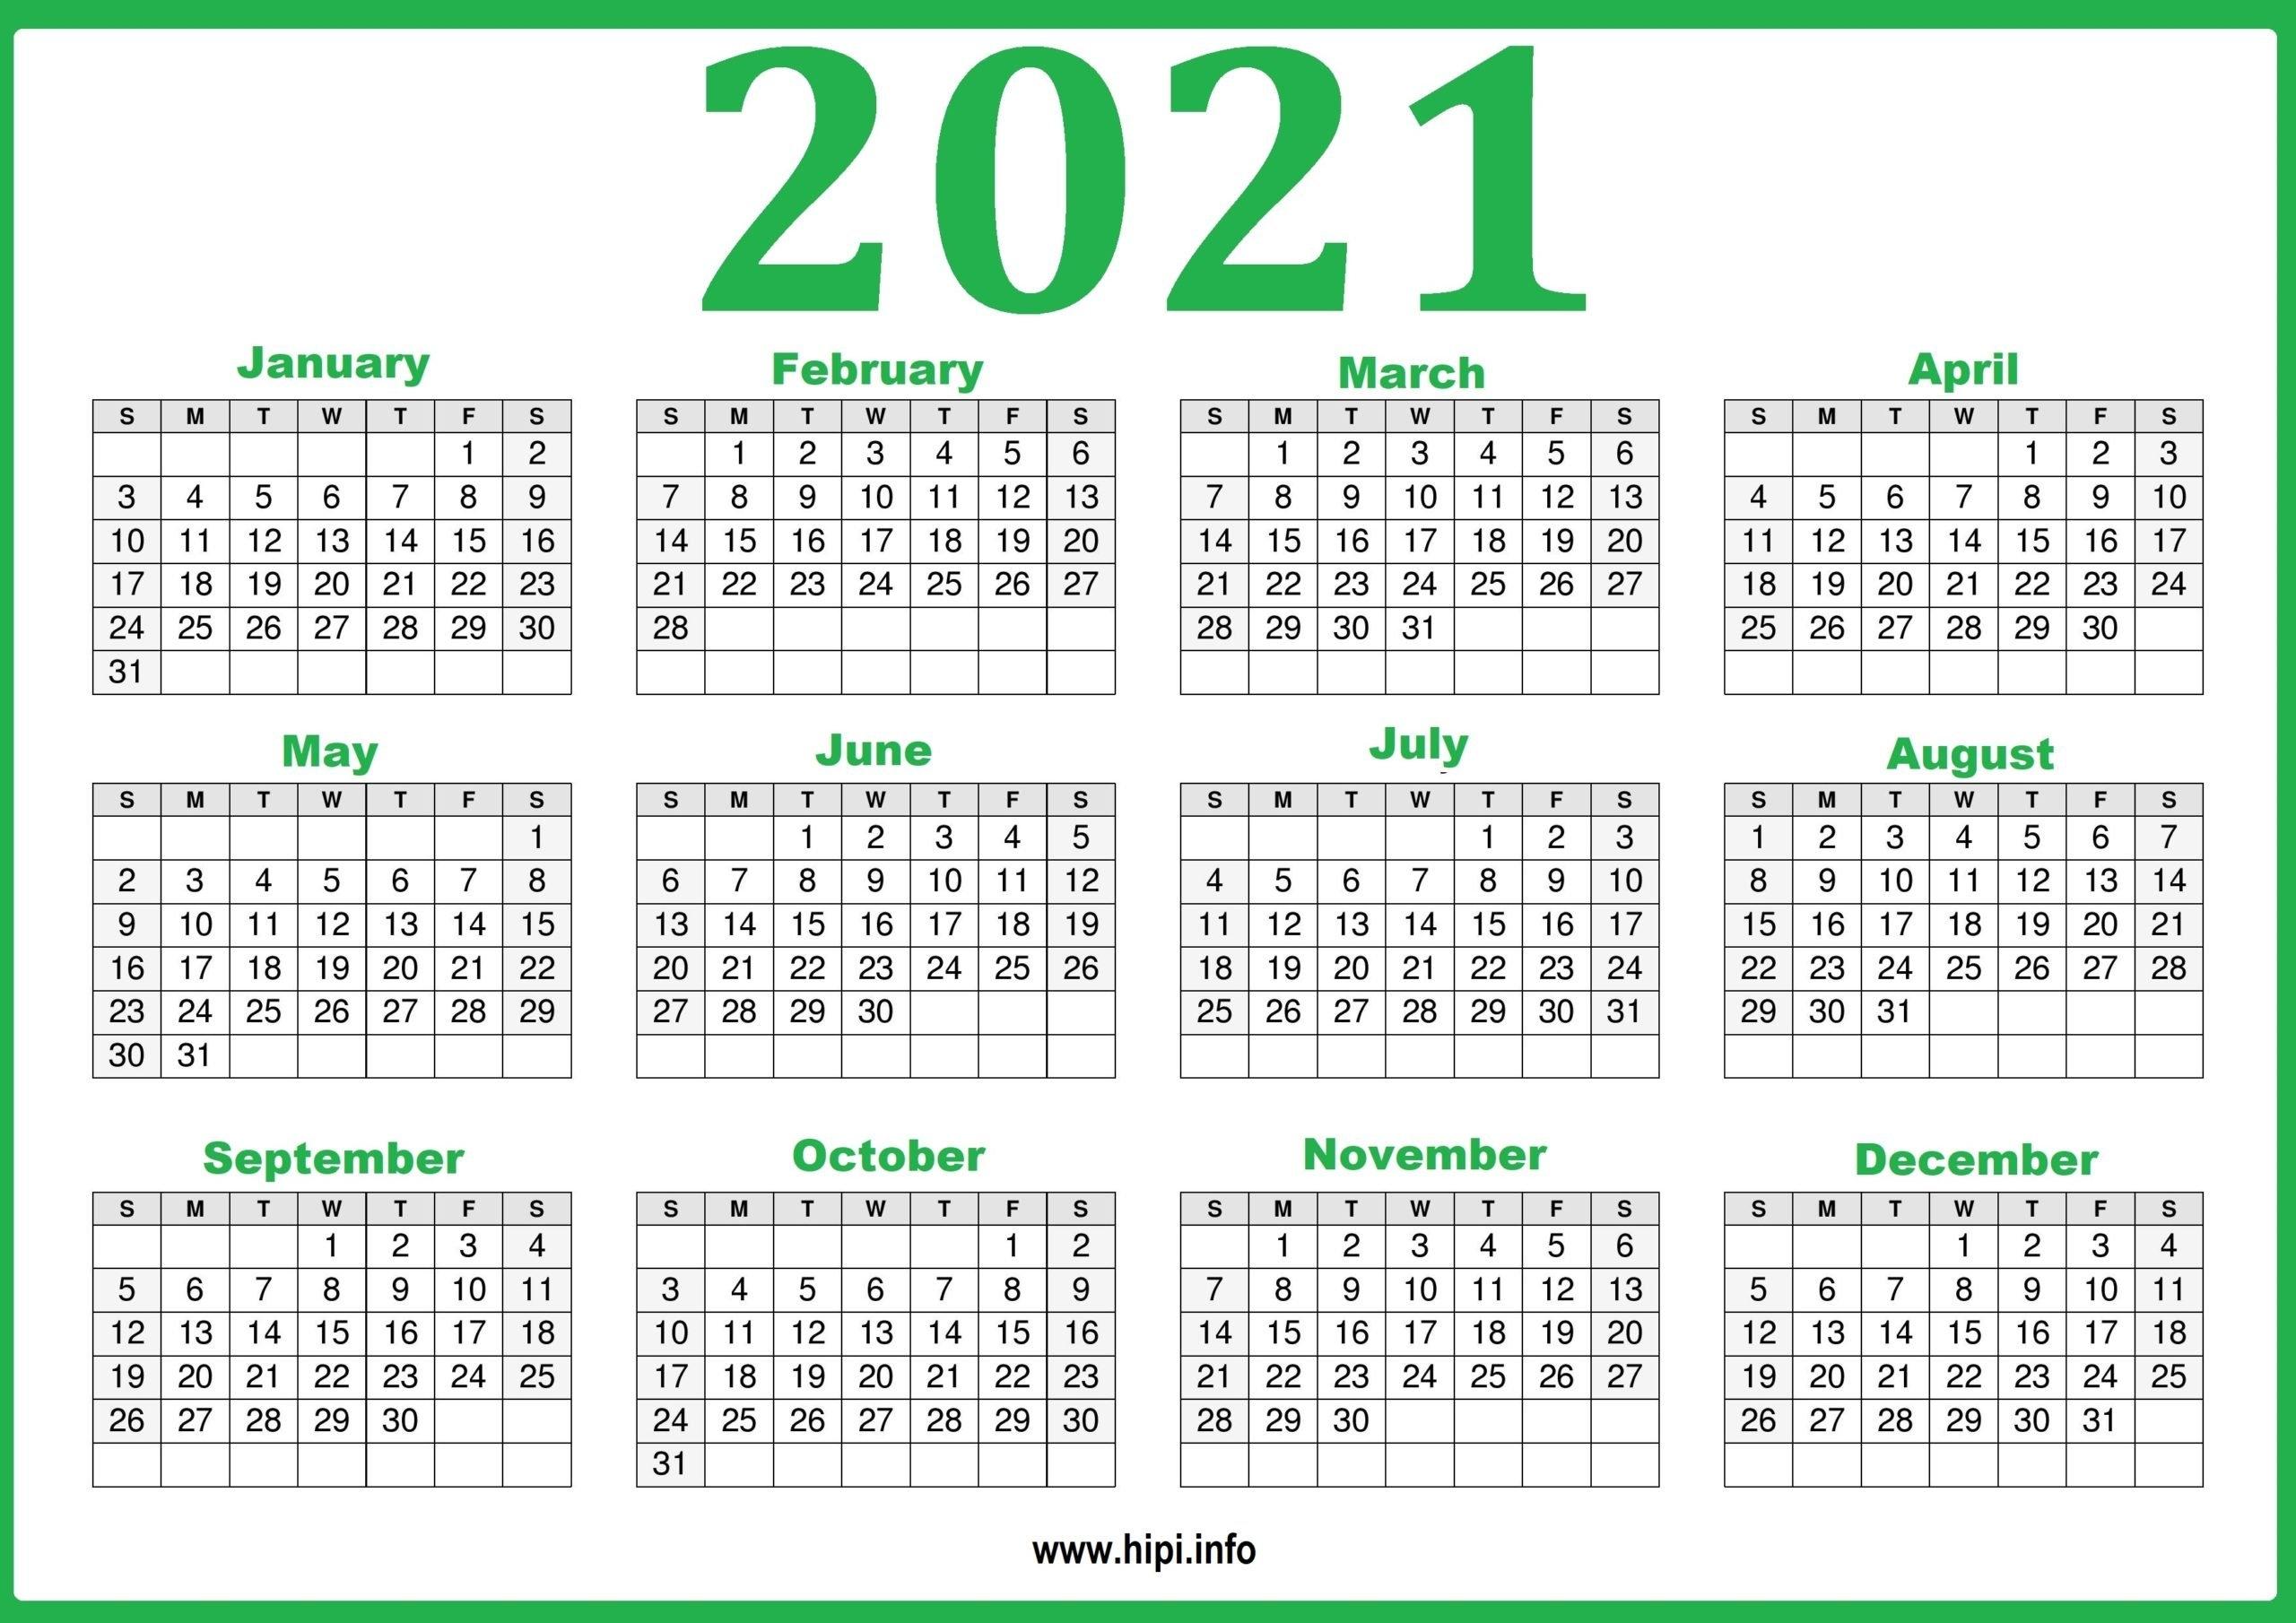 2021 Calendar Printable Yearly Template - Hipi   Calendars Printable Free pertaining to Free Minecraft Calendar 2021 Printable